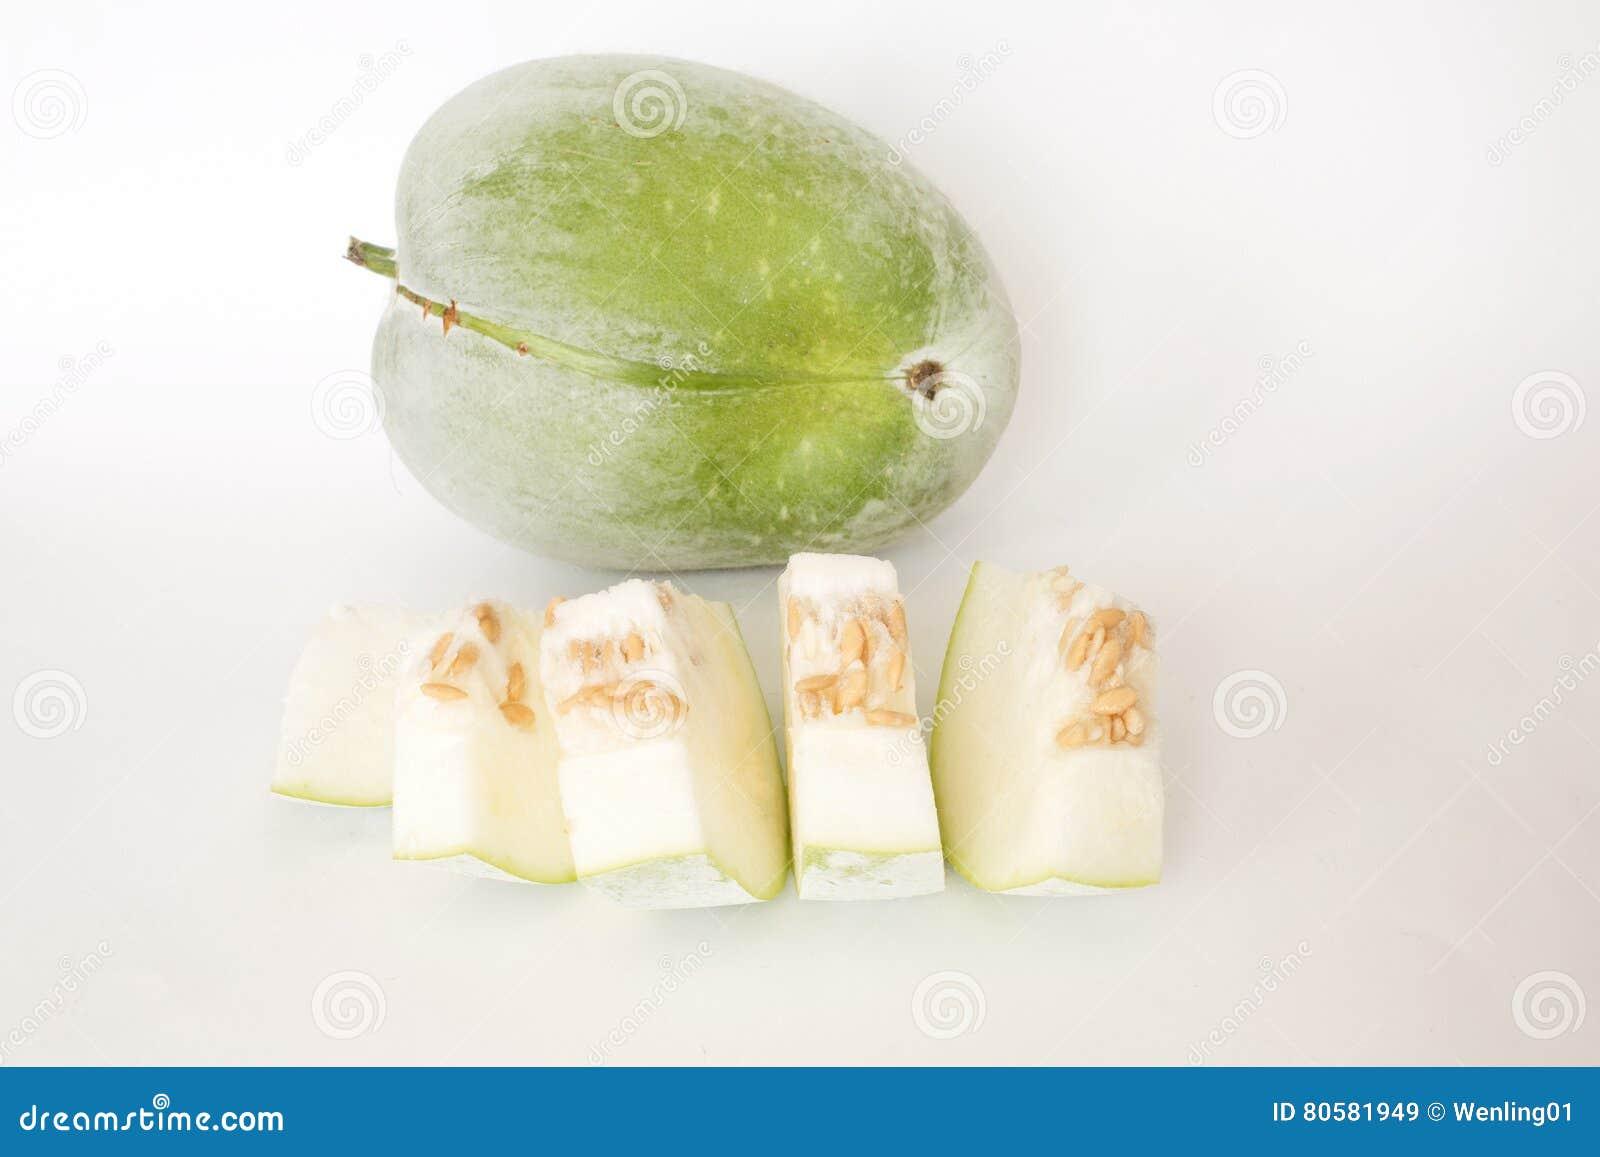 Nice organic winter melon